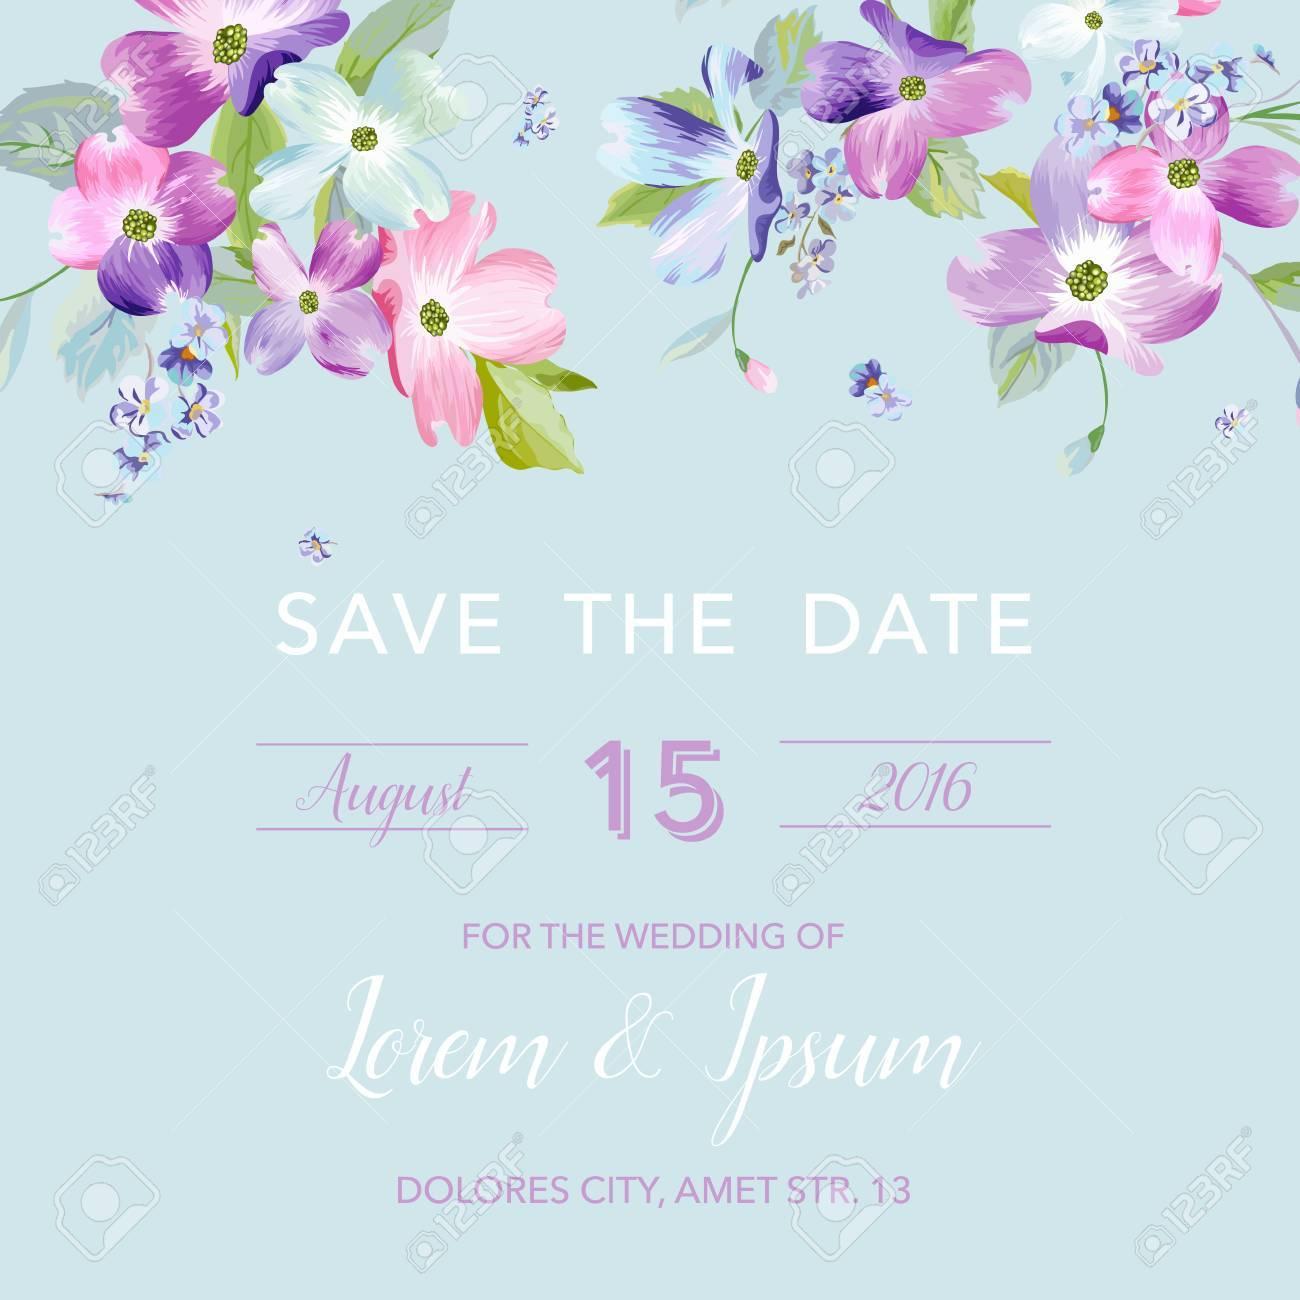 Wedding Invitation Template With Spring Dogwood Flowers Romantic regarding size 1300 X 1300